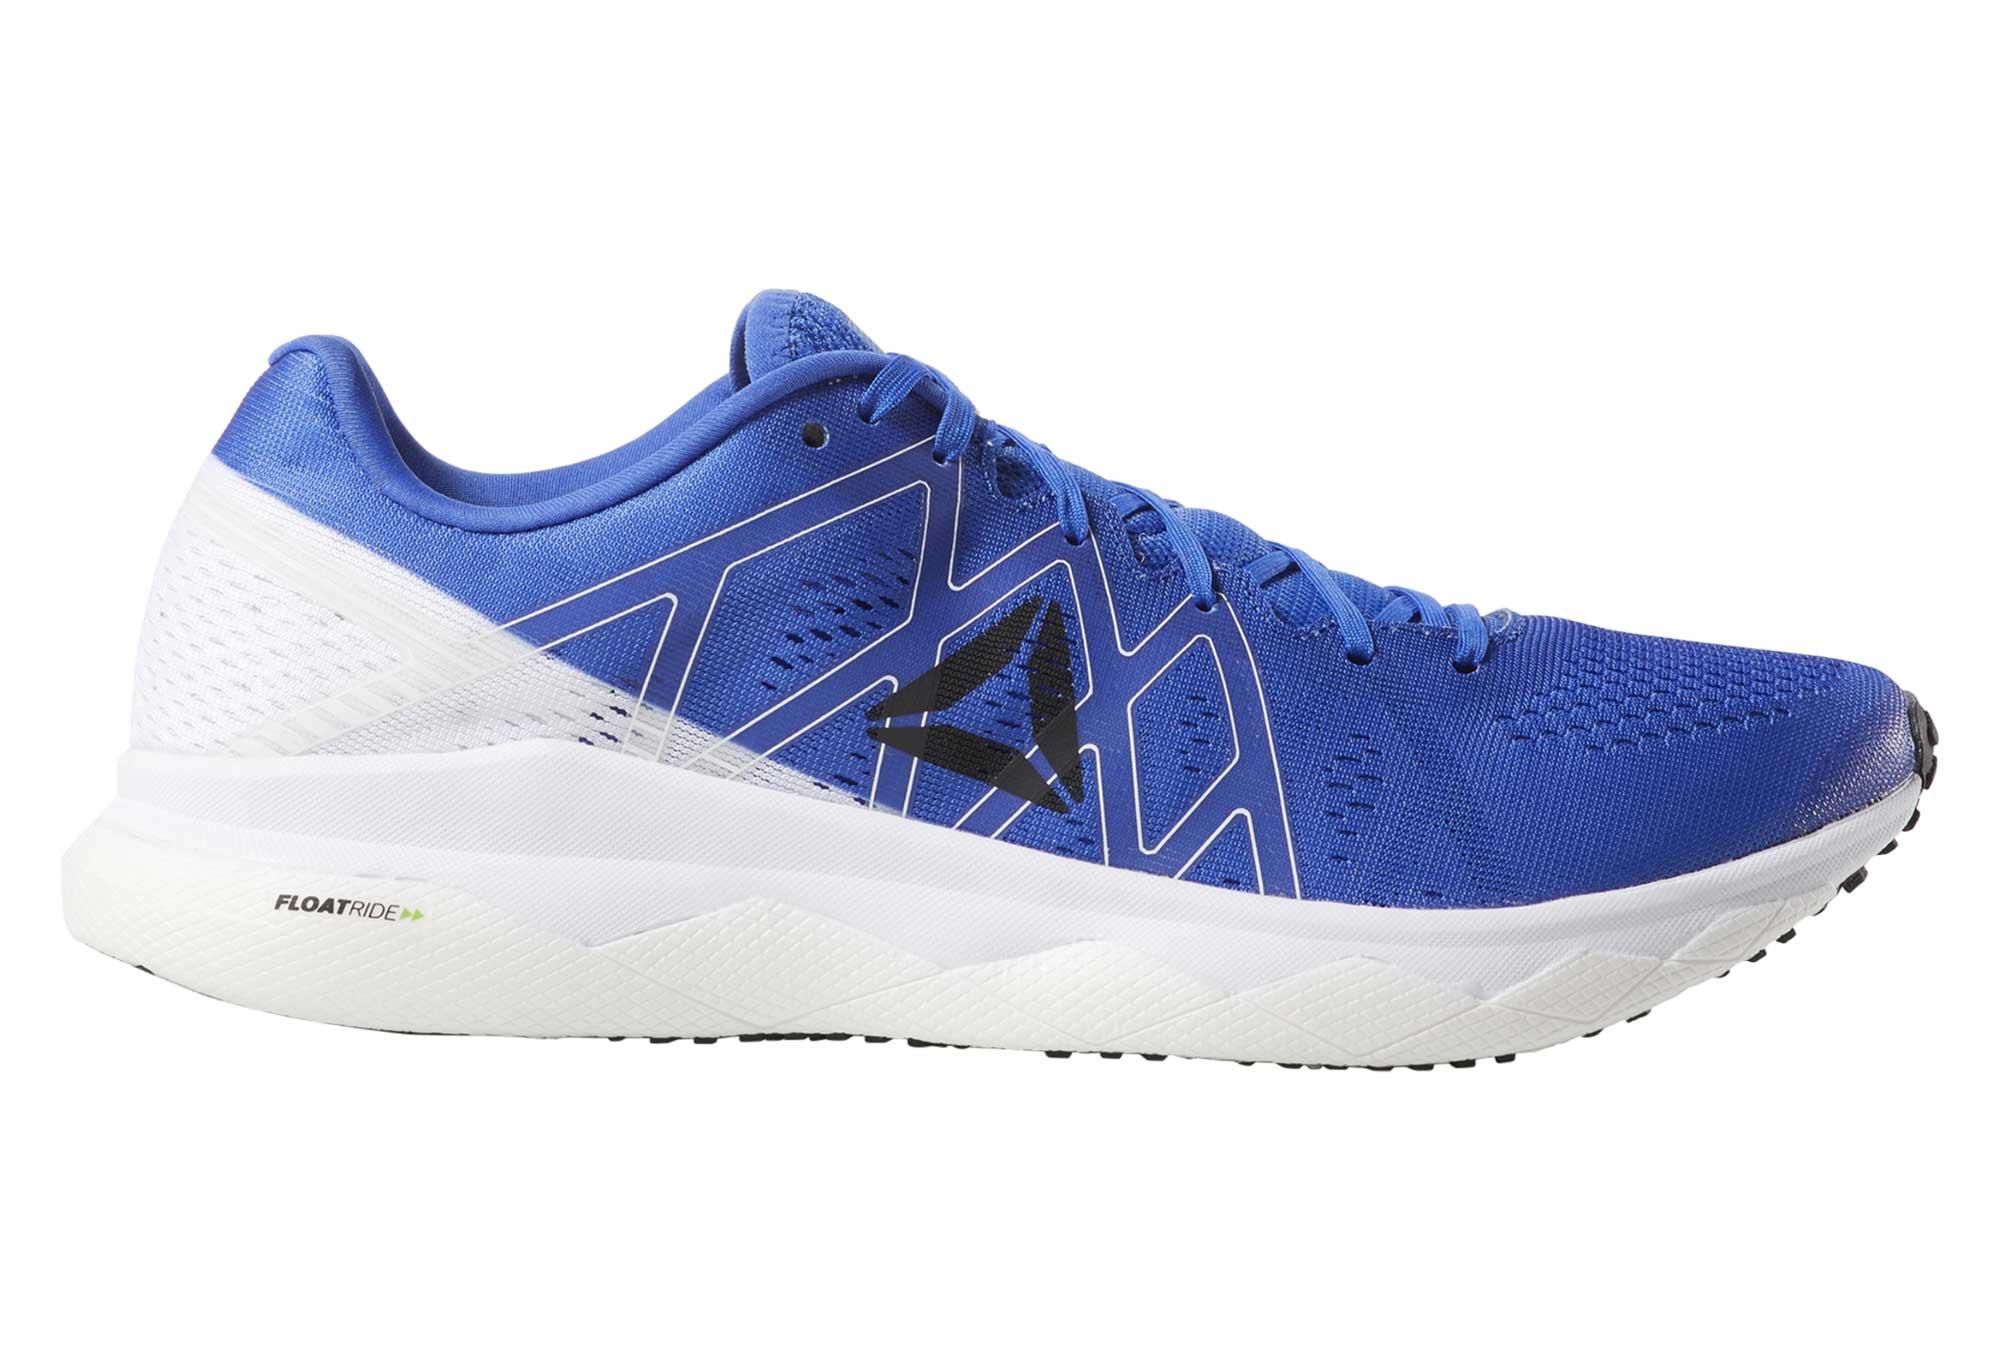 sale retailer 5f818 33152 Reebok Floatride Run Fast Blue White